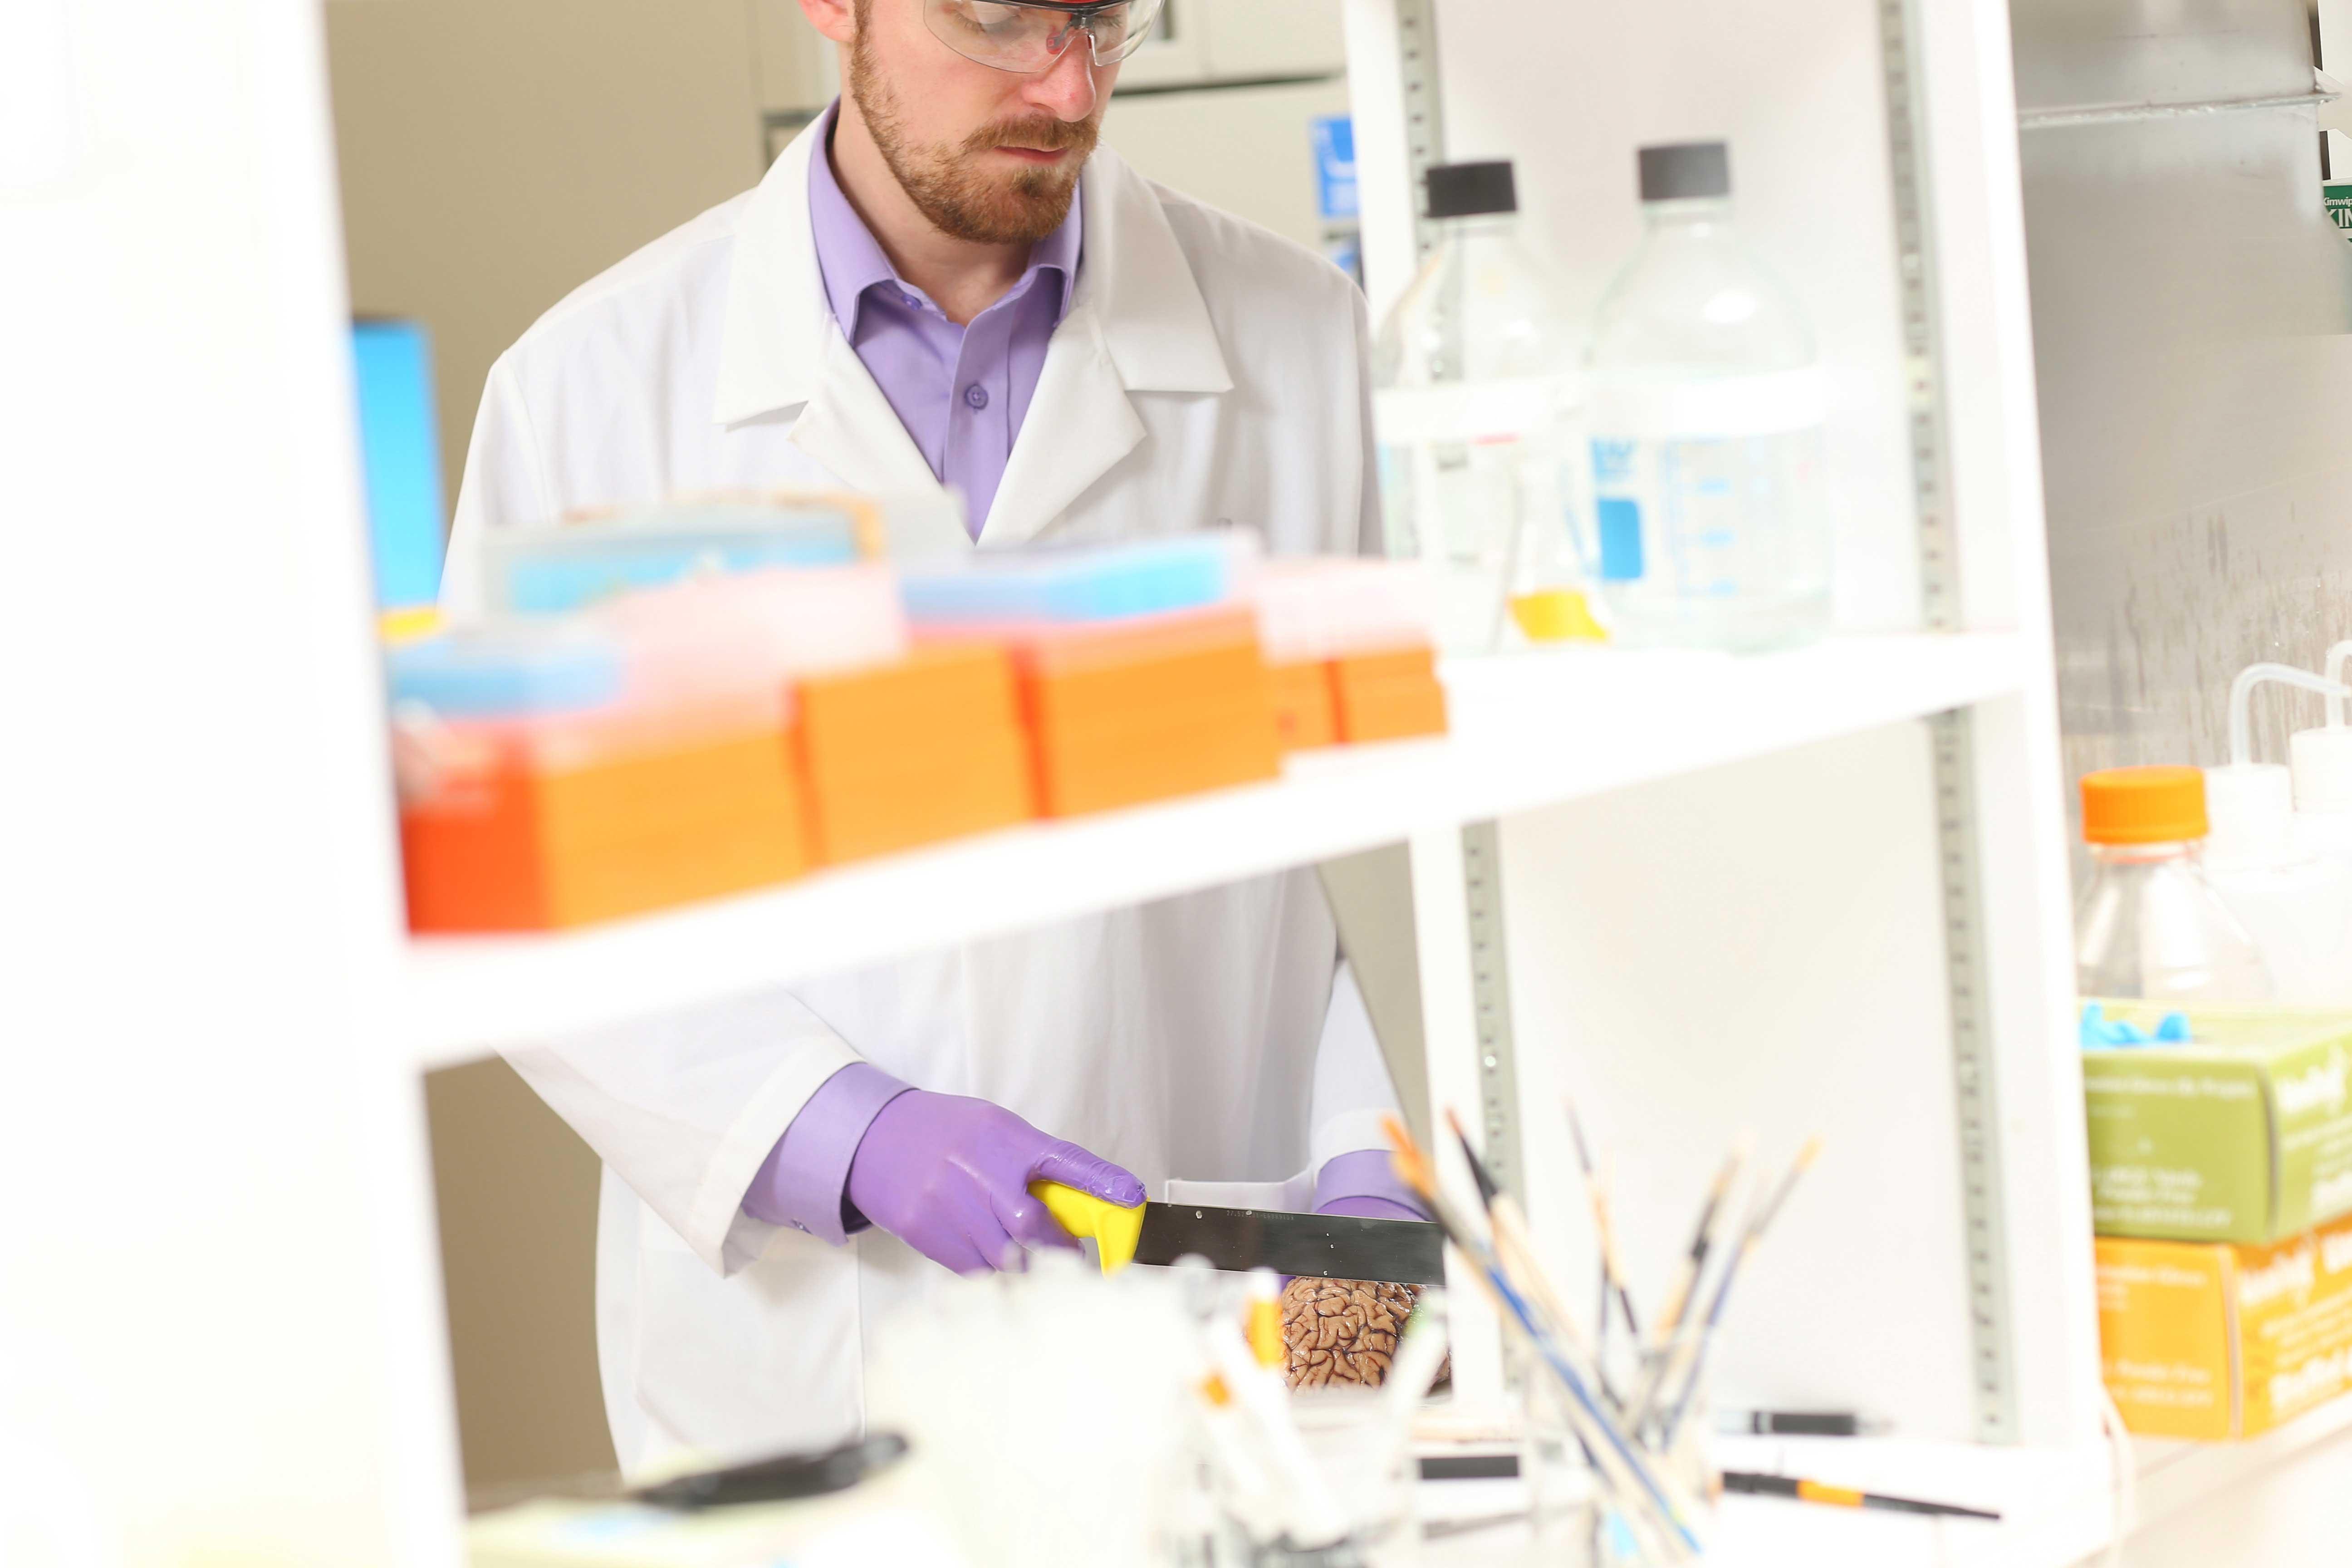 Jordan researching in a lab